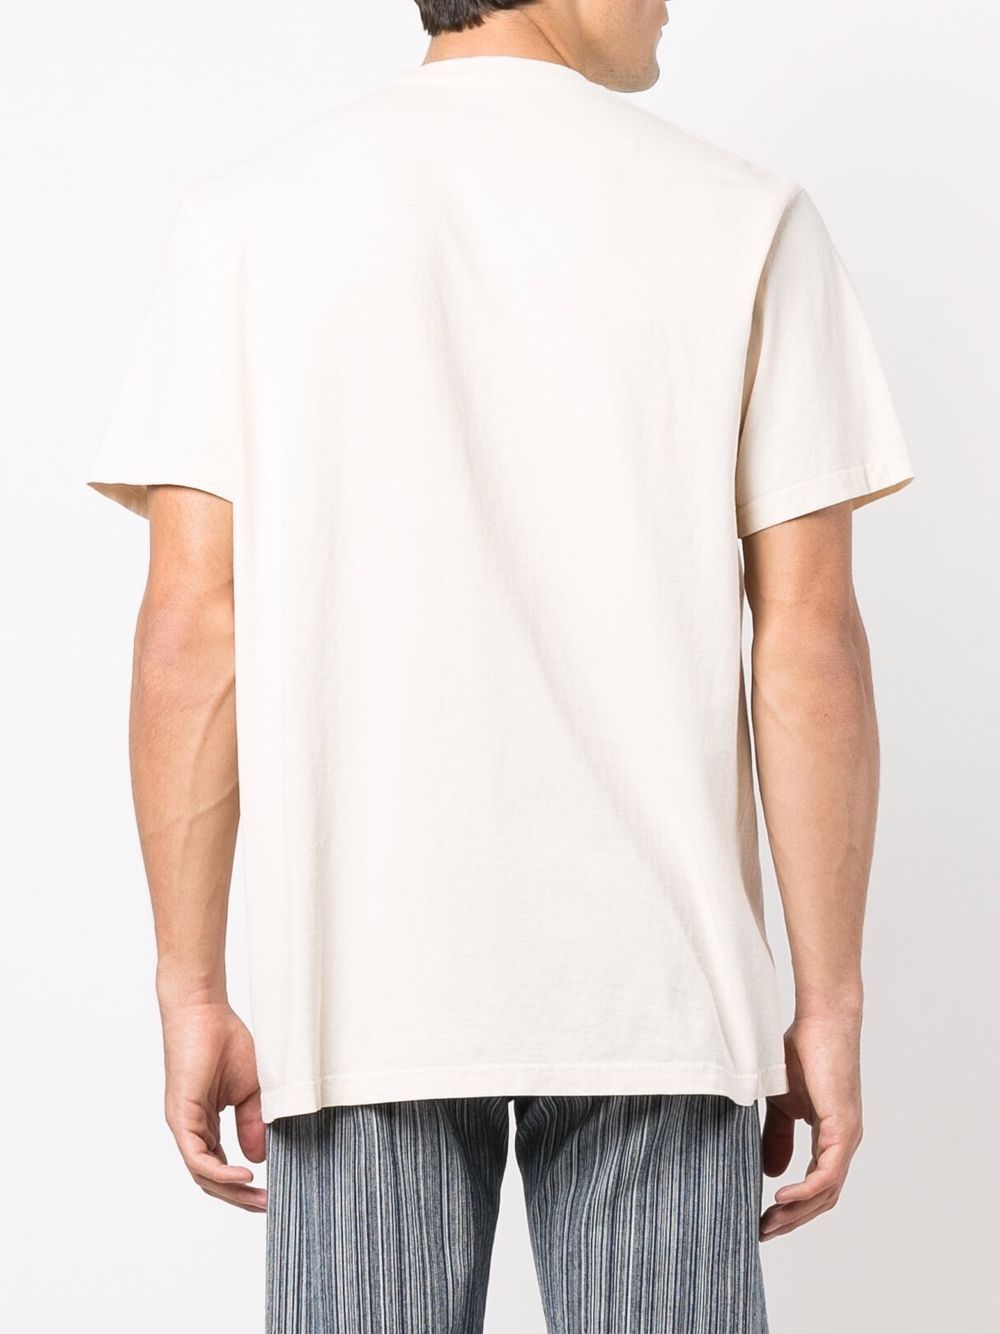 t-shirt con logo in cotone SPORTY & RICH | T-shirt | TS181MK